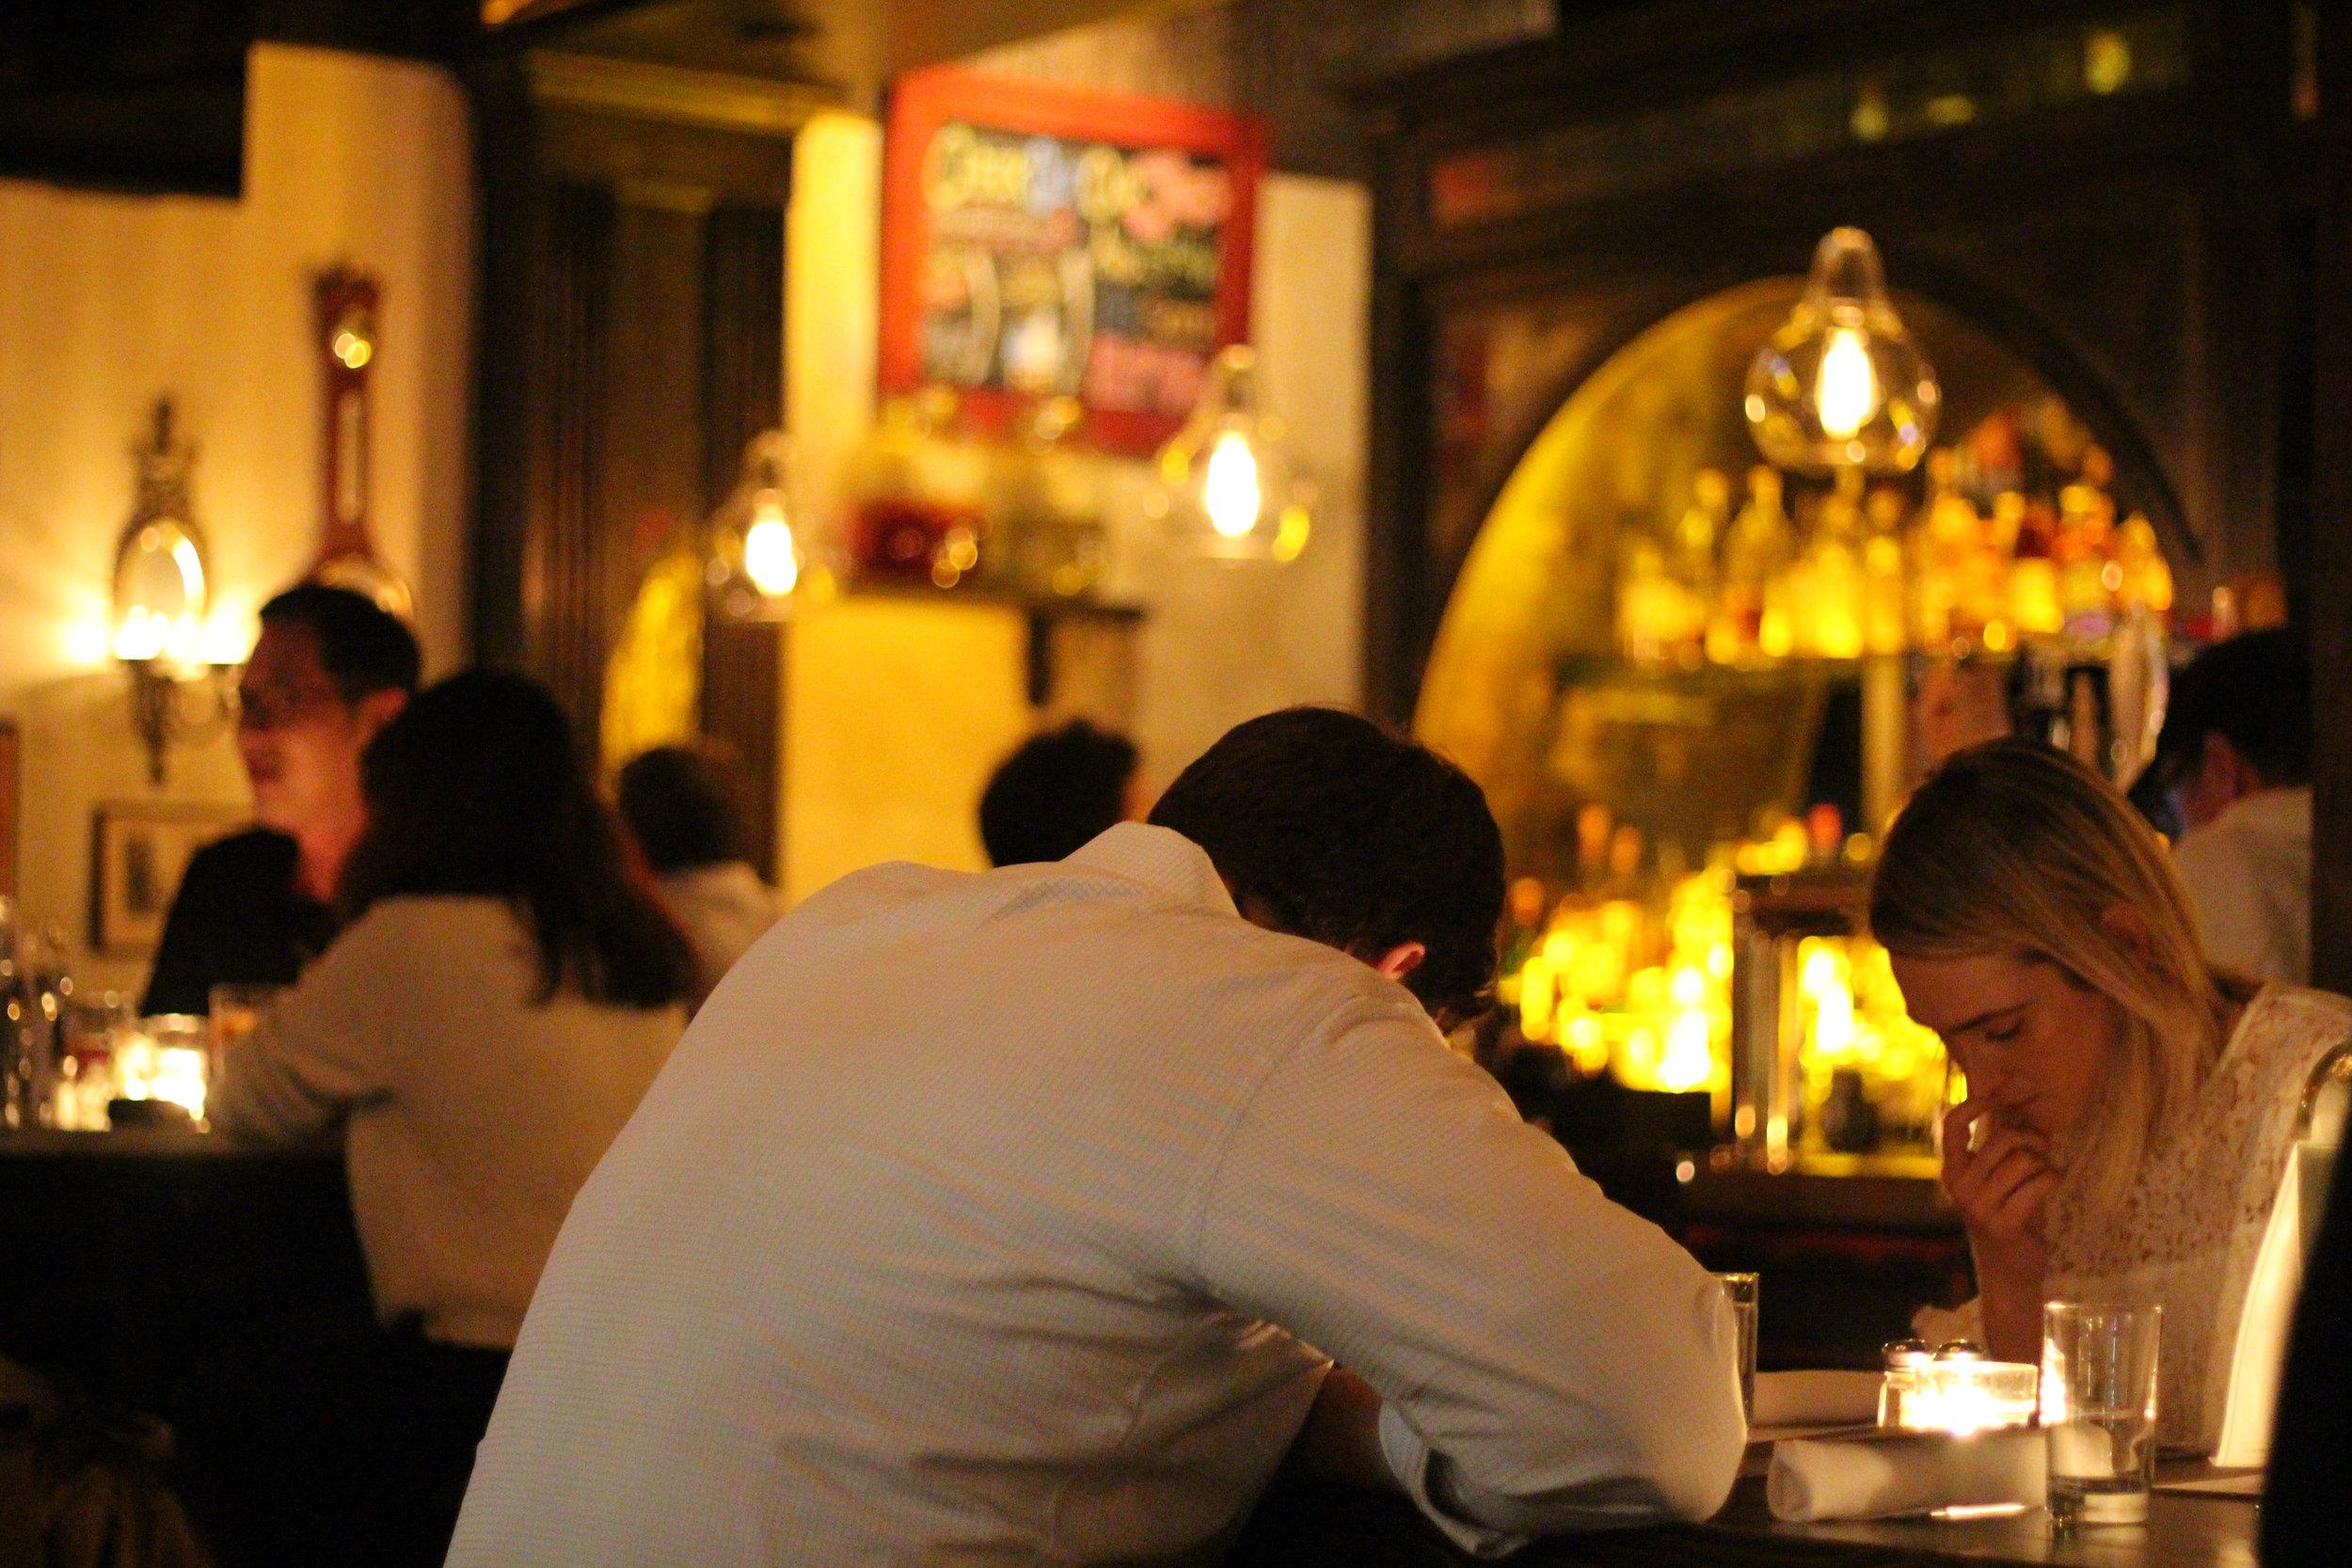 Studying the menu at White Oak Tavern